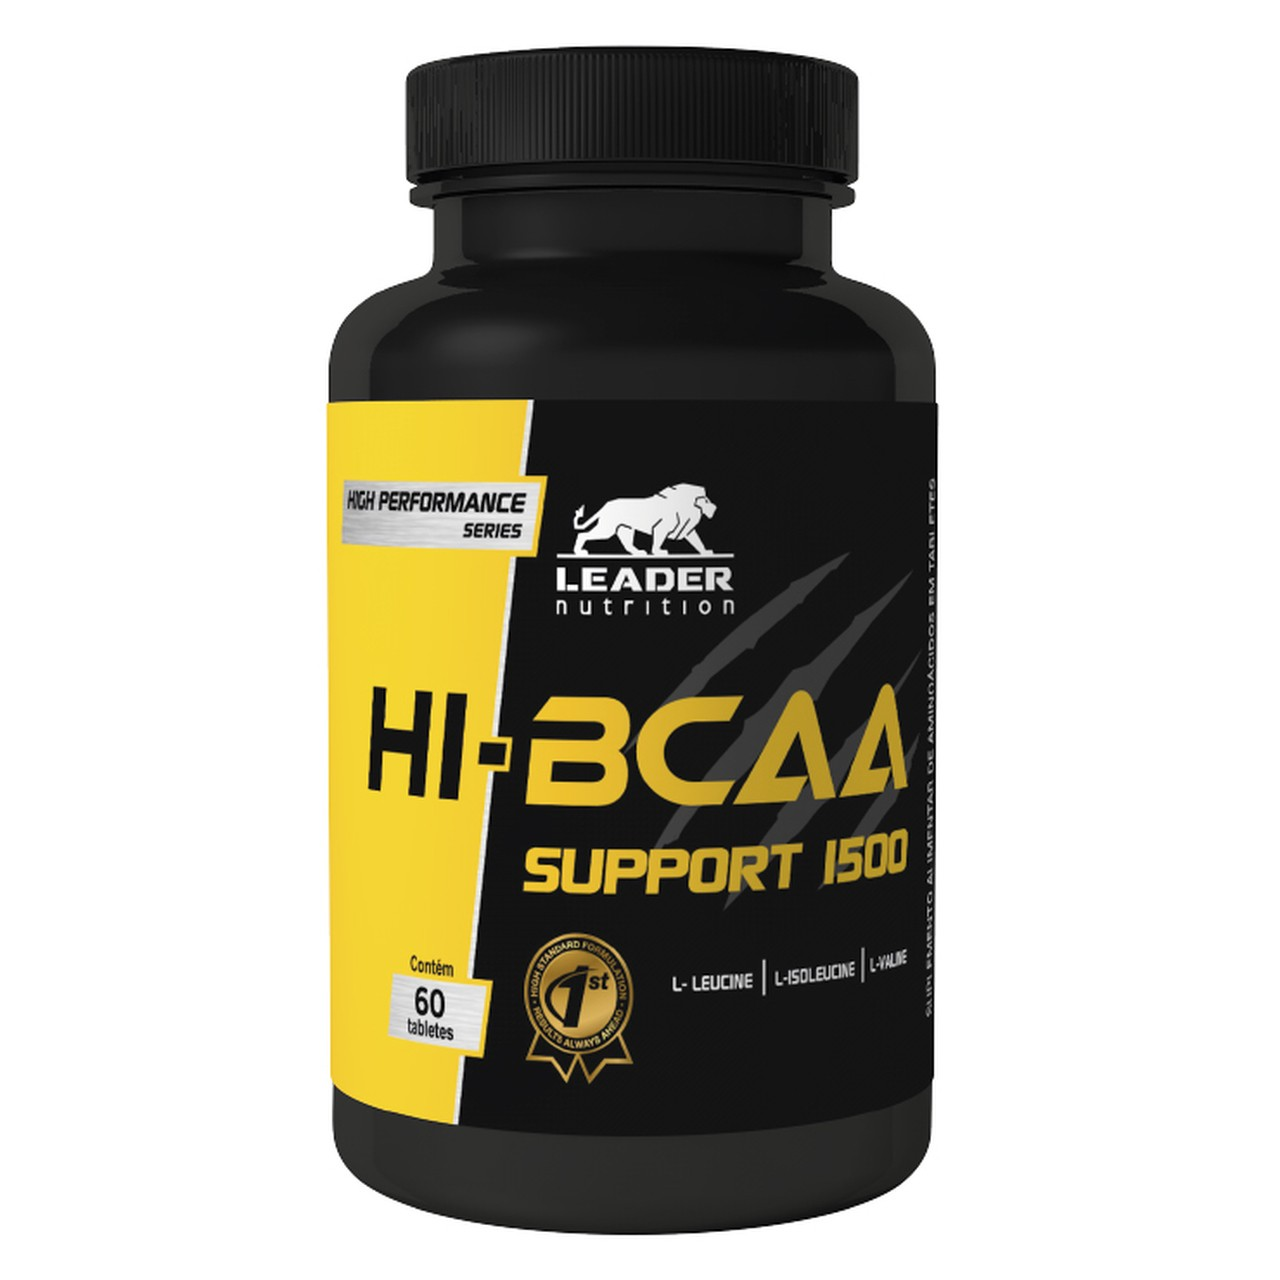 Hi-BCAA Support 1500 (60 Tabs) - Leader Nutrition